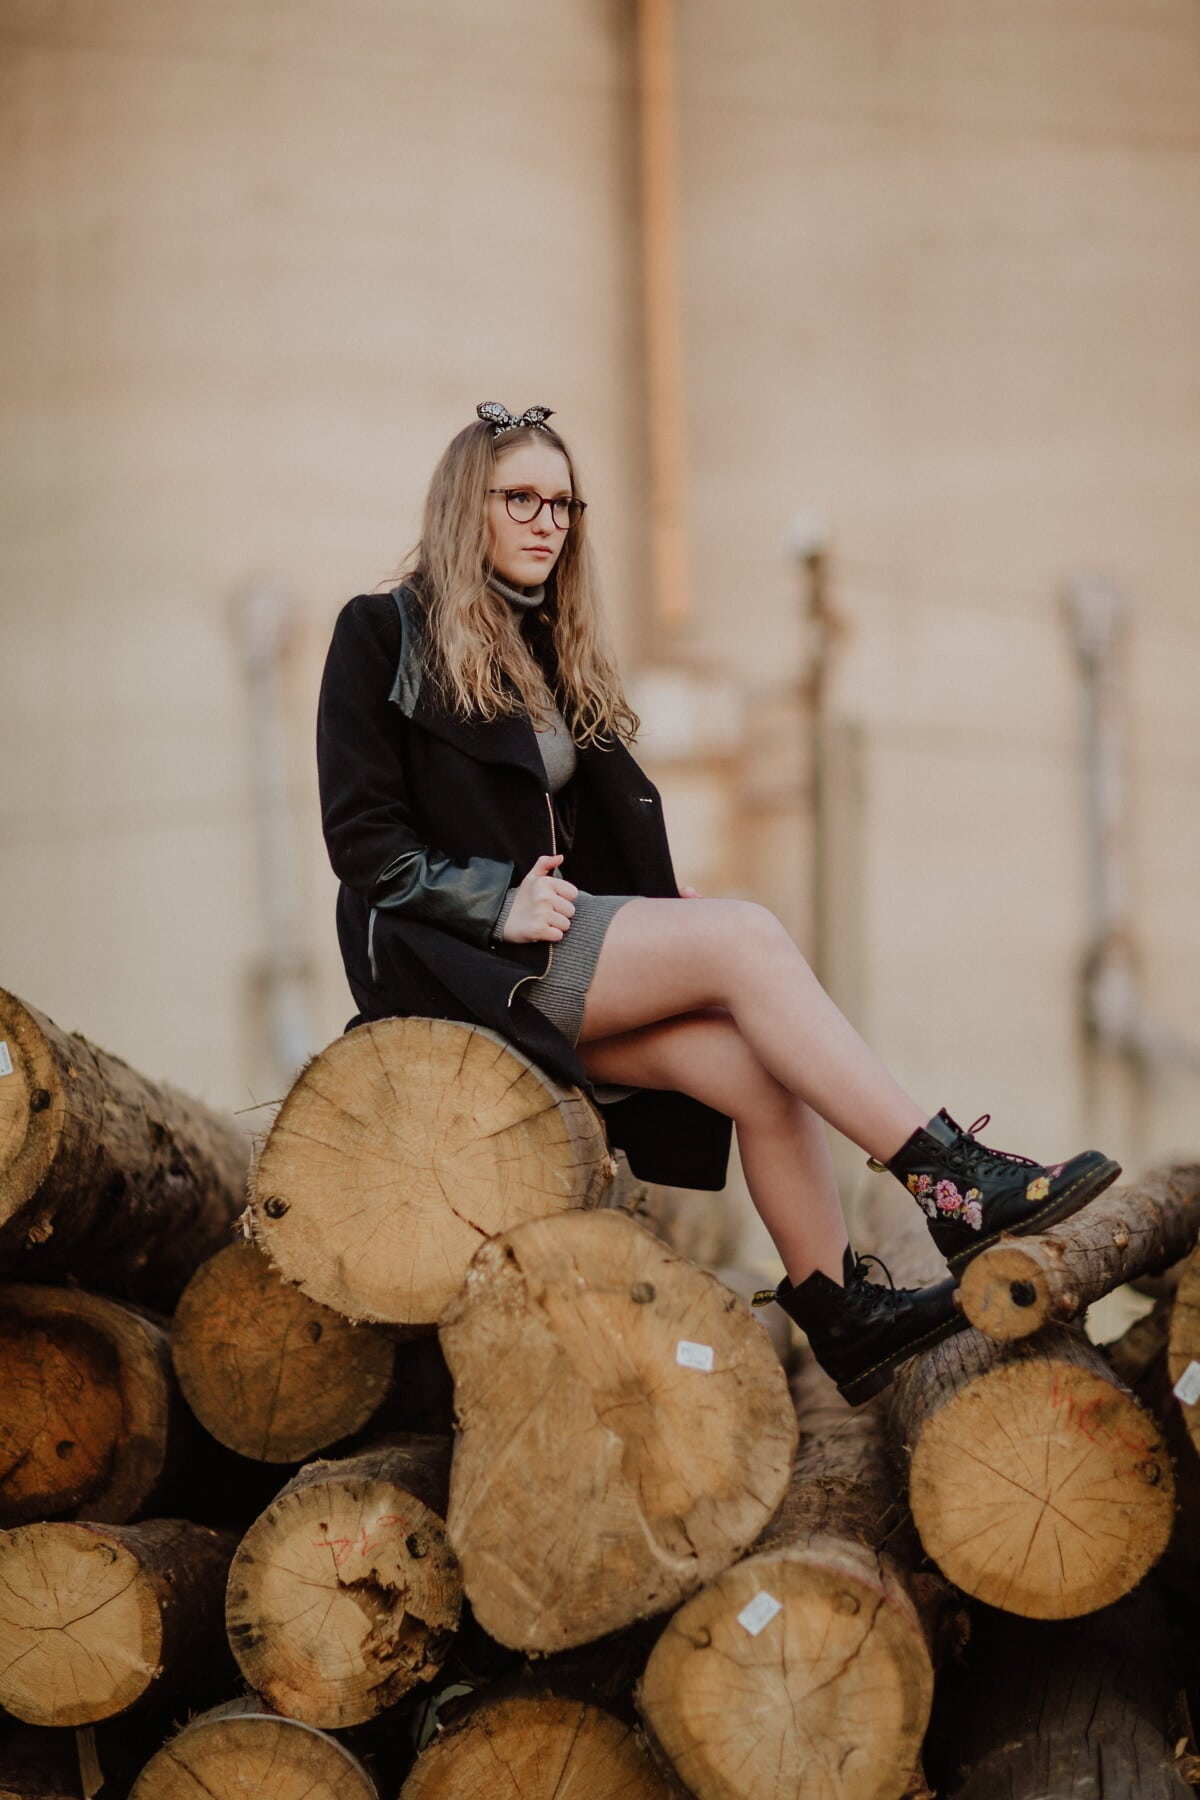 teenager, pretty girl, wood, sitting, autumn season, woman, people, girl, fashion, portrait